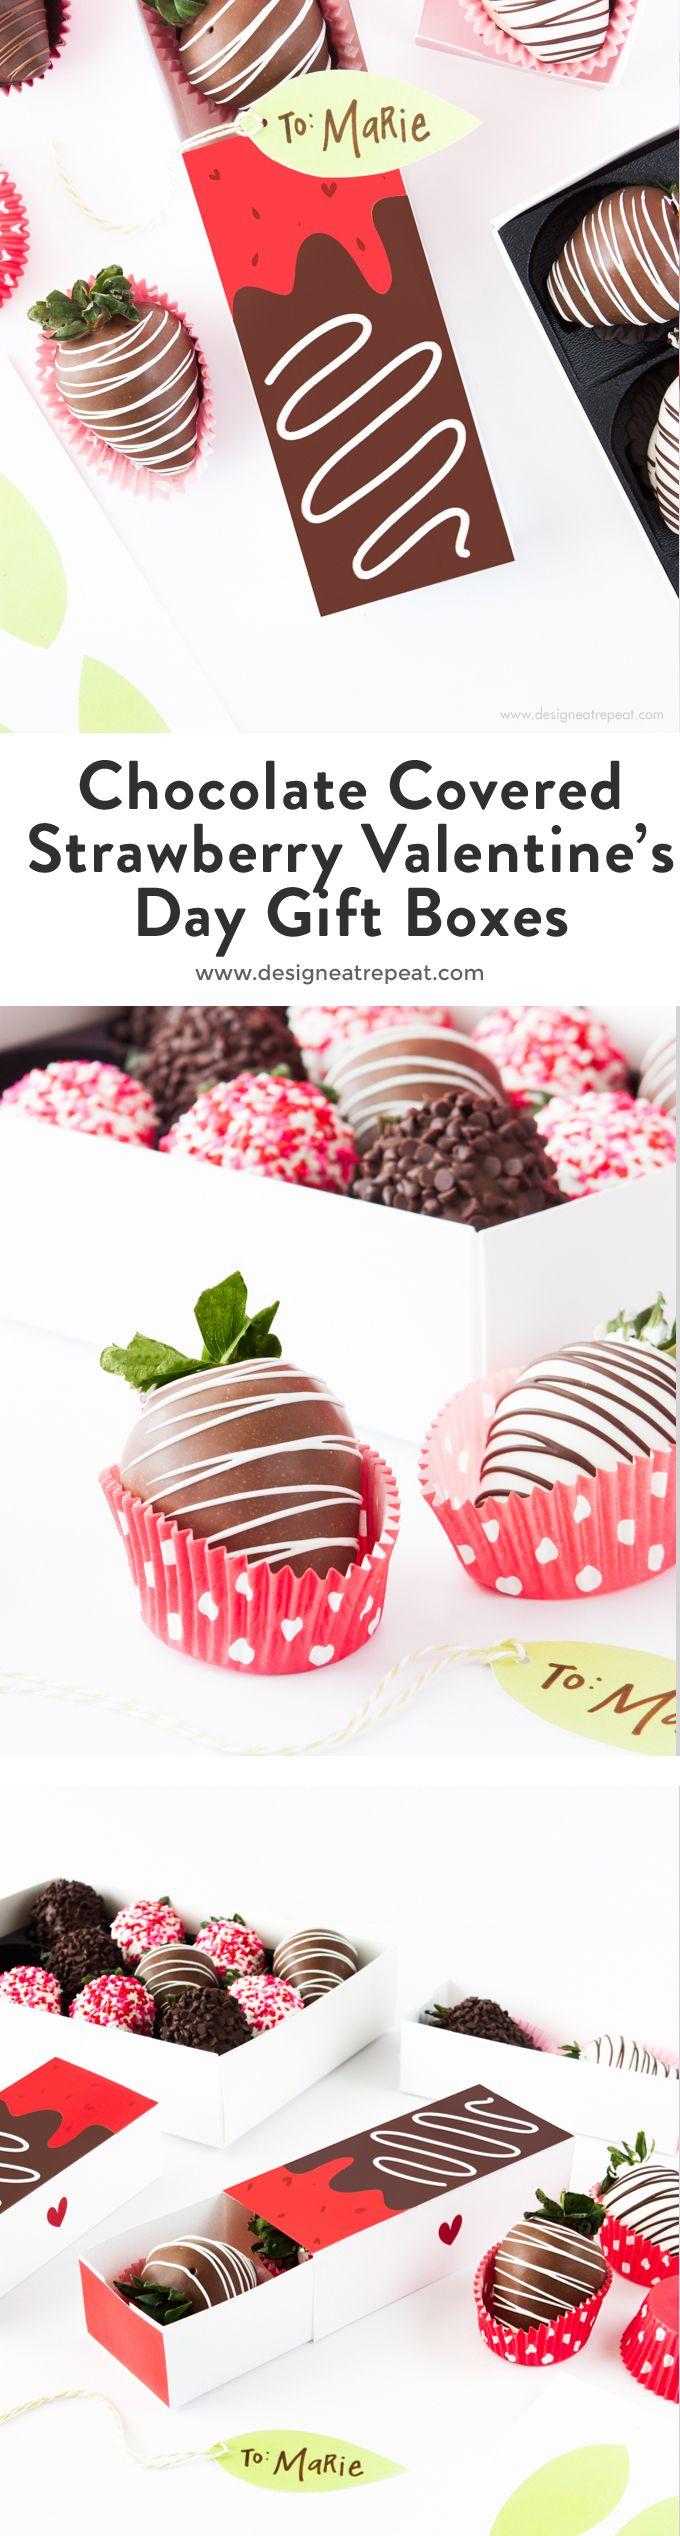 Where To Buy Chocolate Covered Strawberries In Kansas City